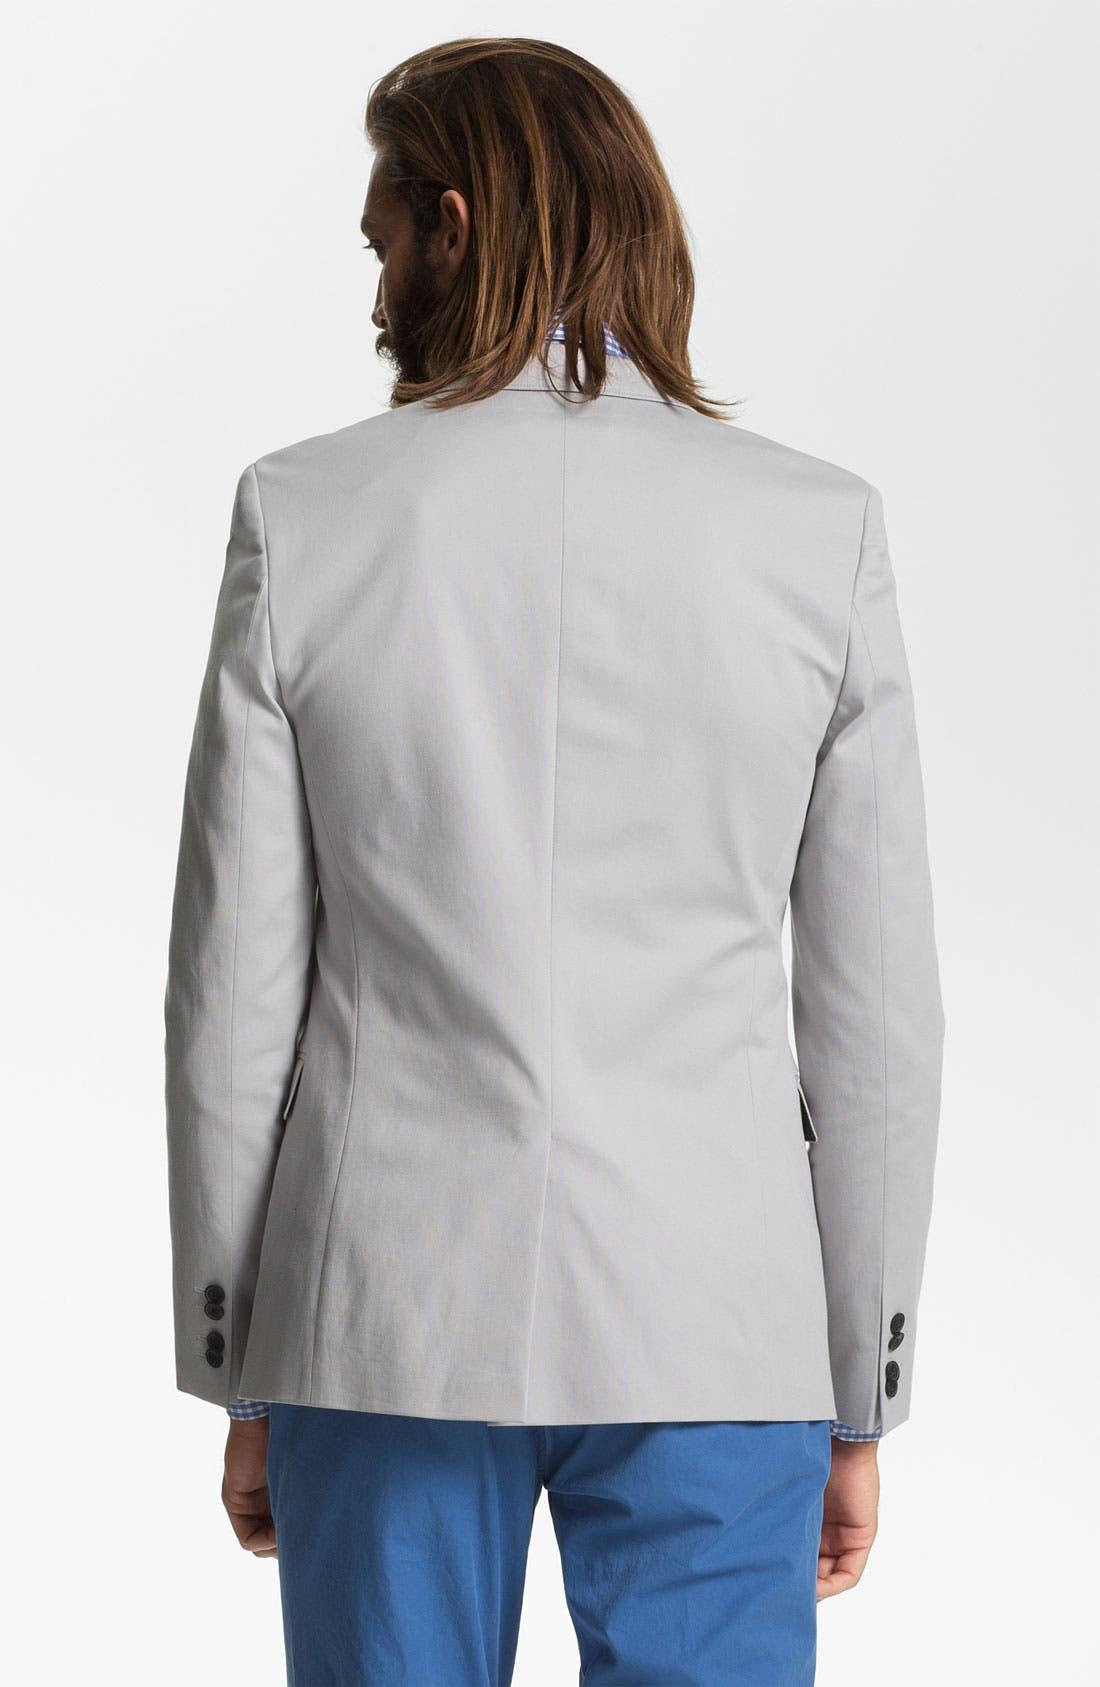 ZZDNUHUGO BOSS, HUGO 'Aeris' Trim Fit Cotton Blend Blazer, Alternate thumbnail 5, color, 030